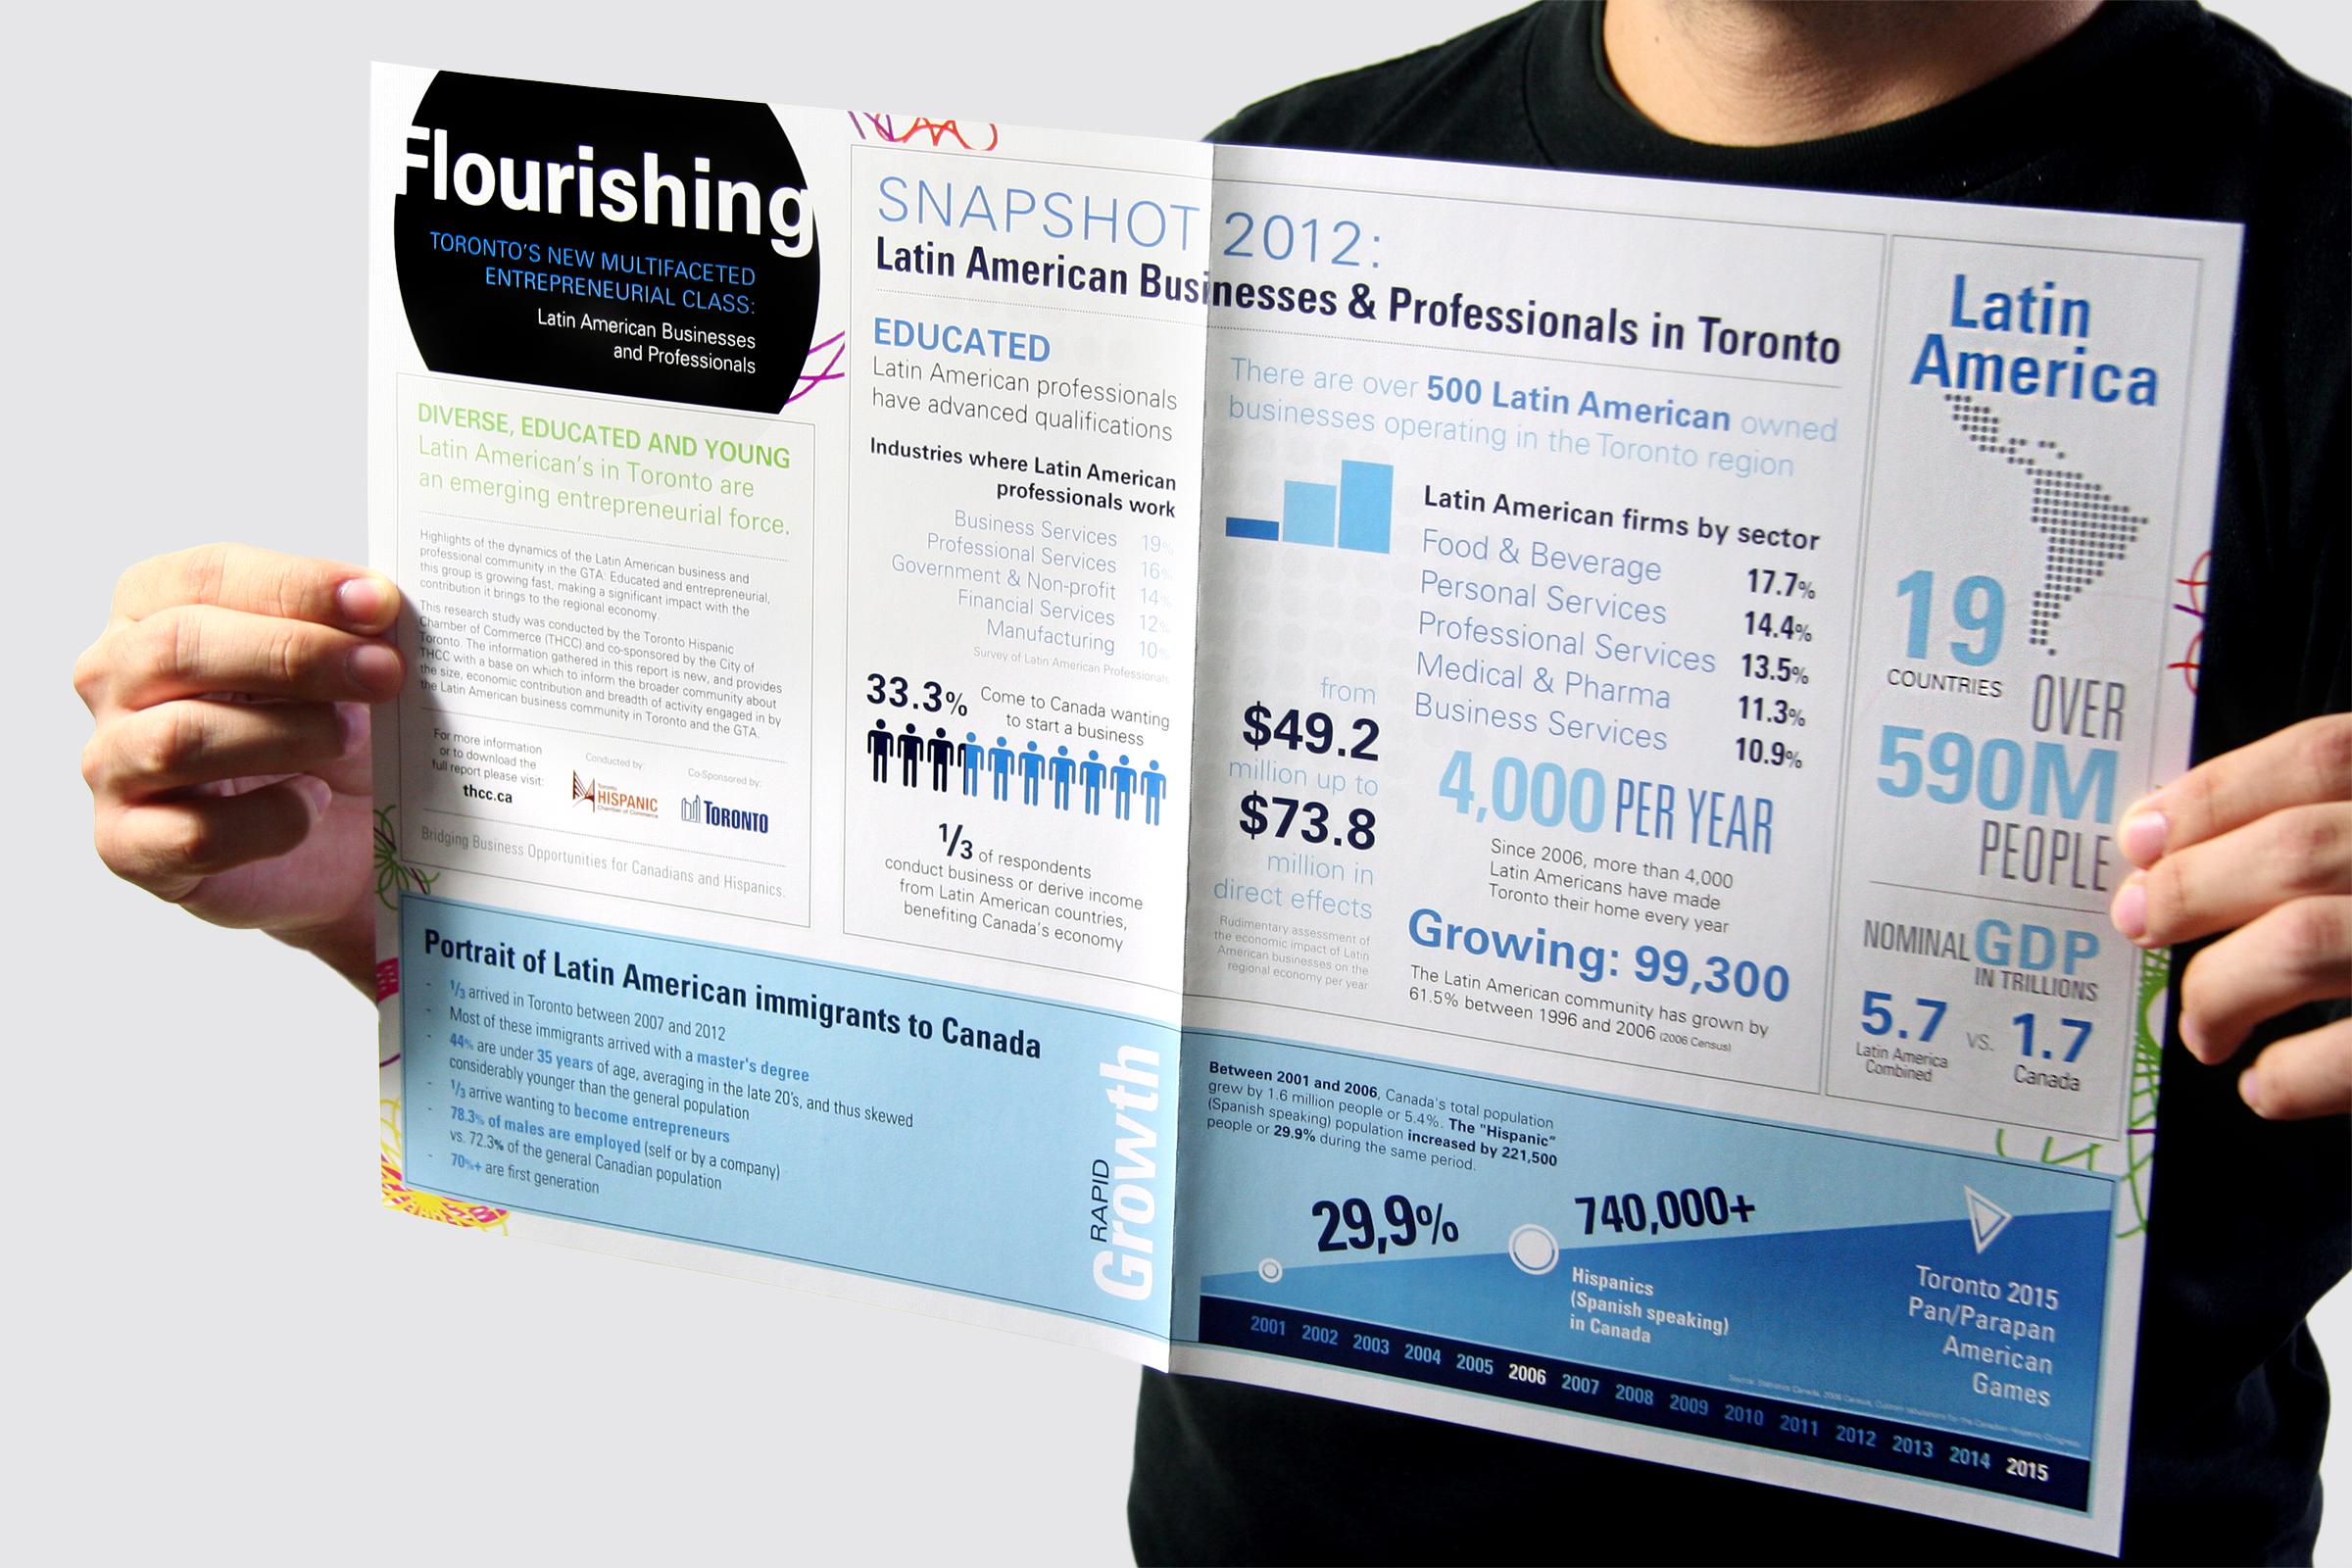 Flourishing Infographic